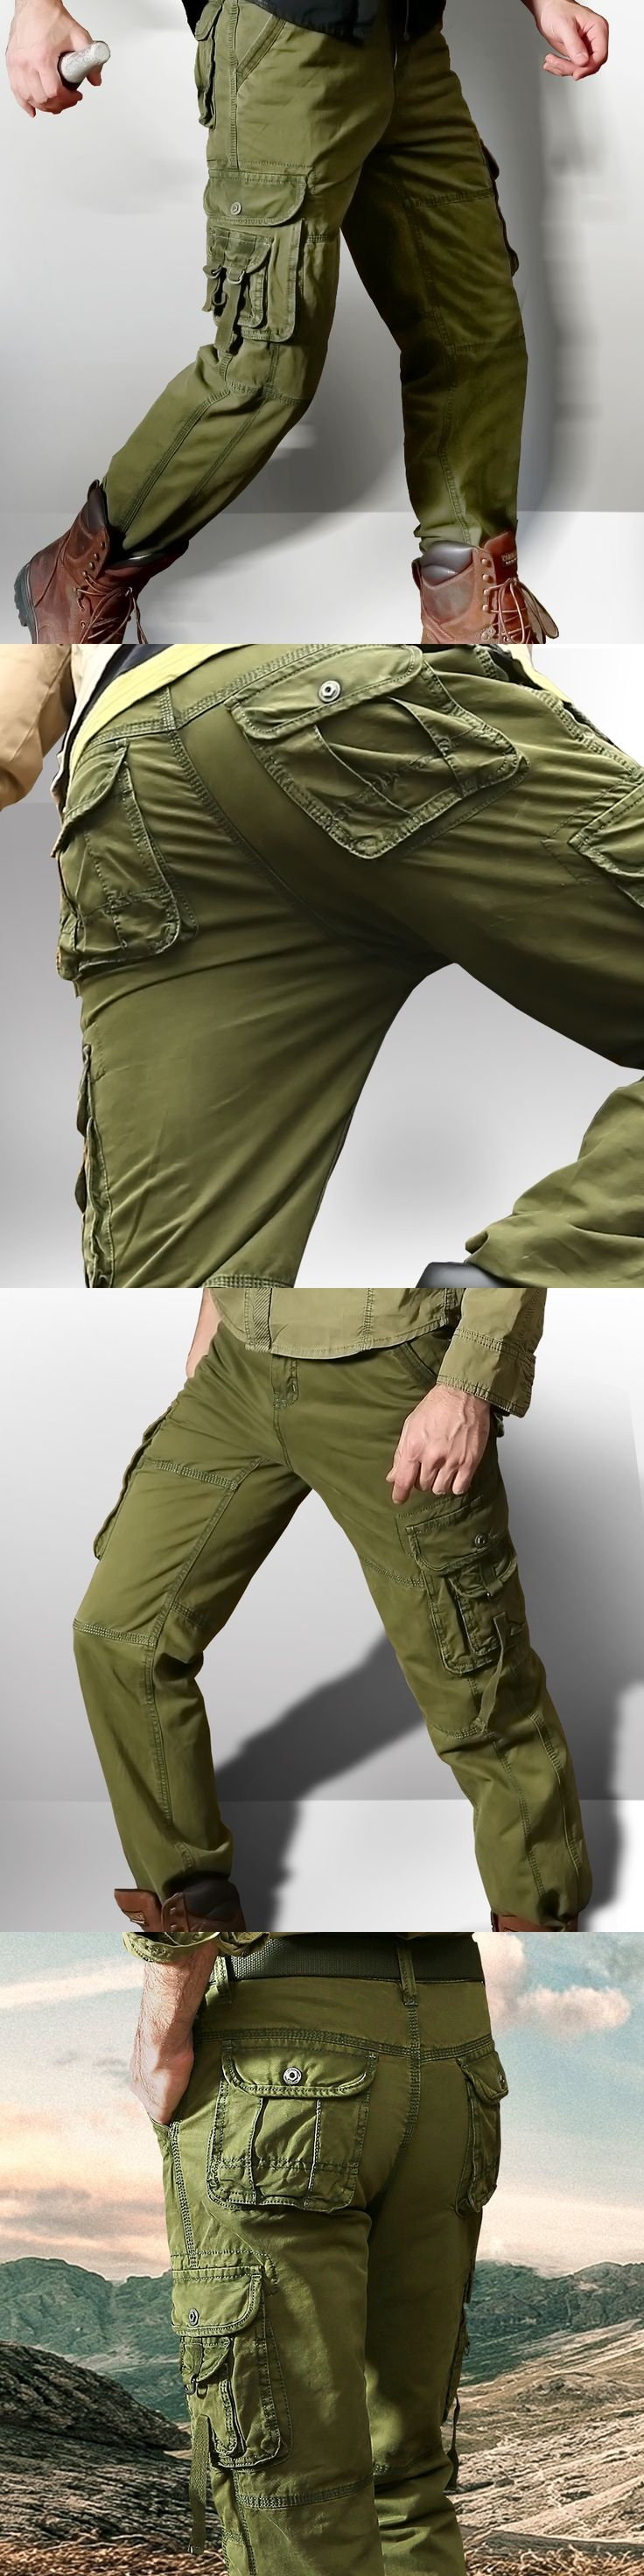 Militar Tactical Cargo Pants Men Combat Army Green Train Military Pants Casual Cotton Paintball  Trouser  Men Workout Pants